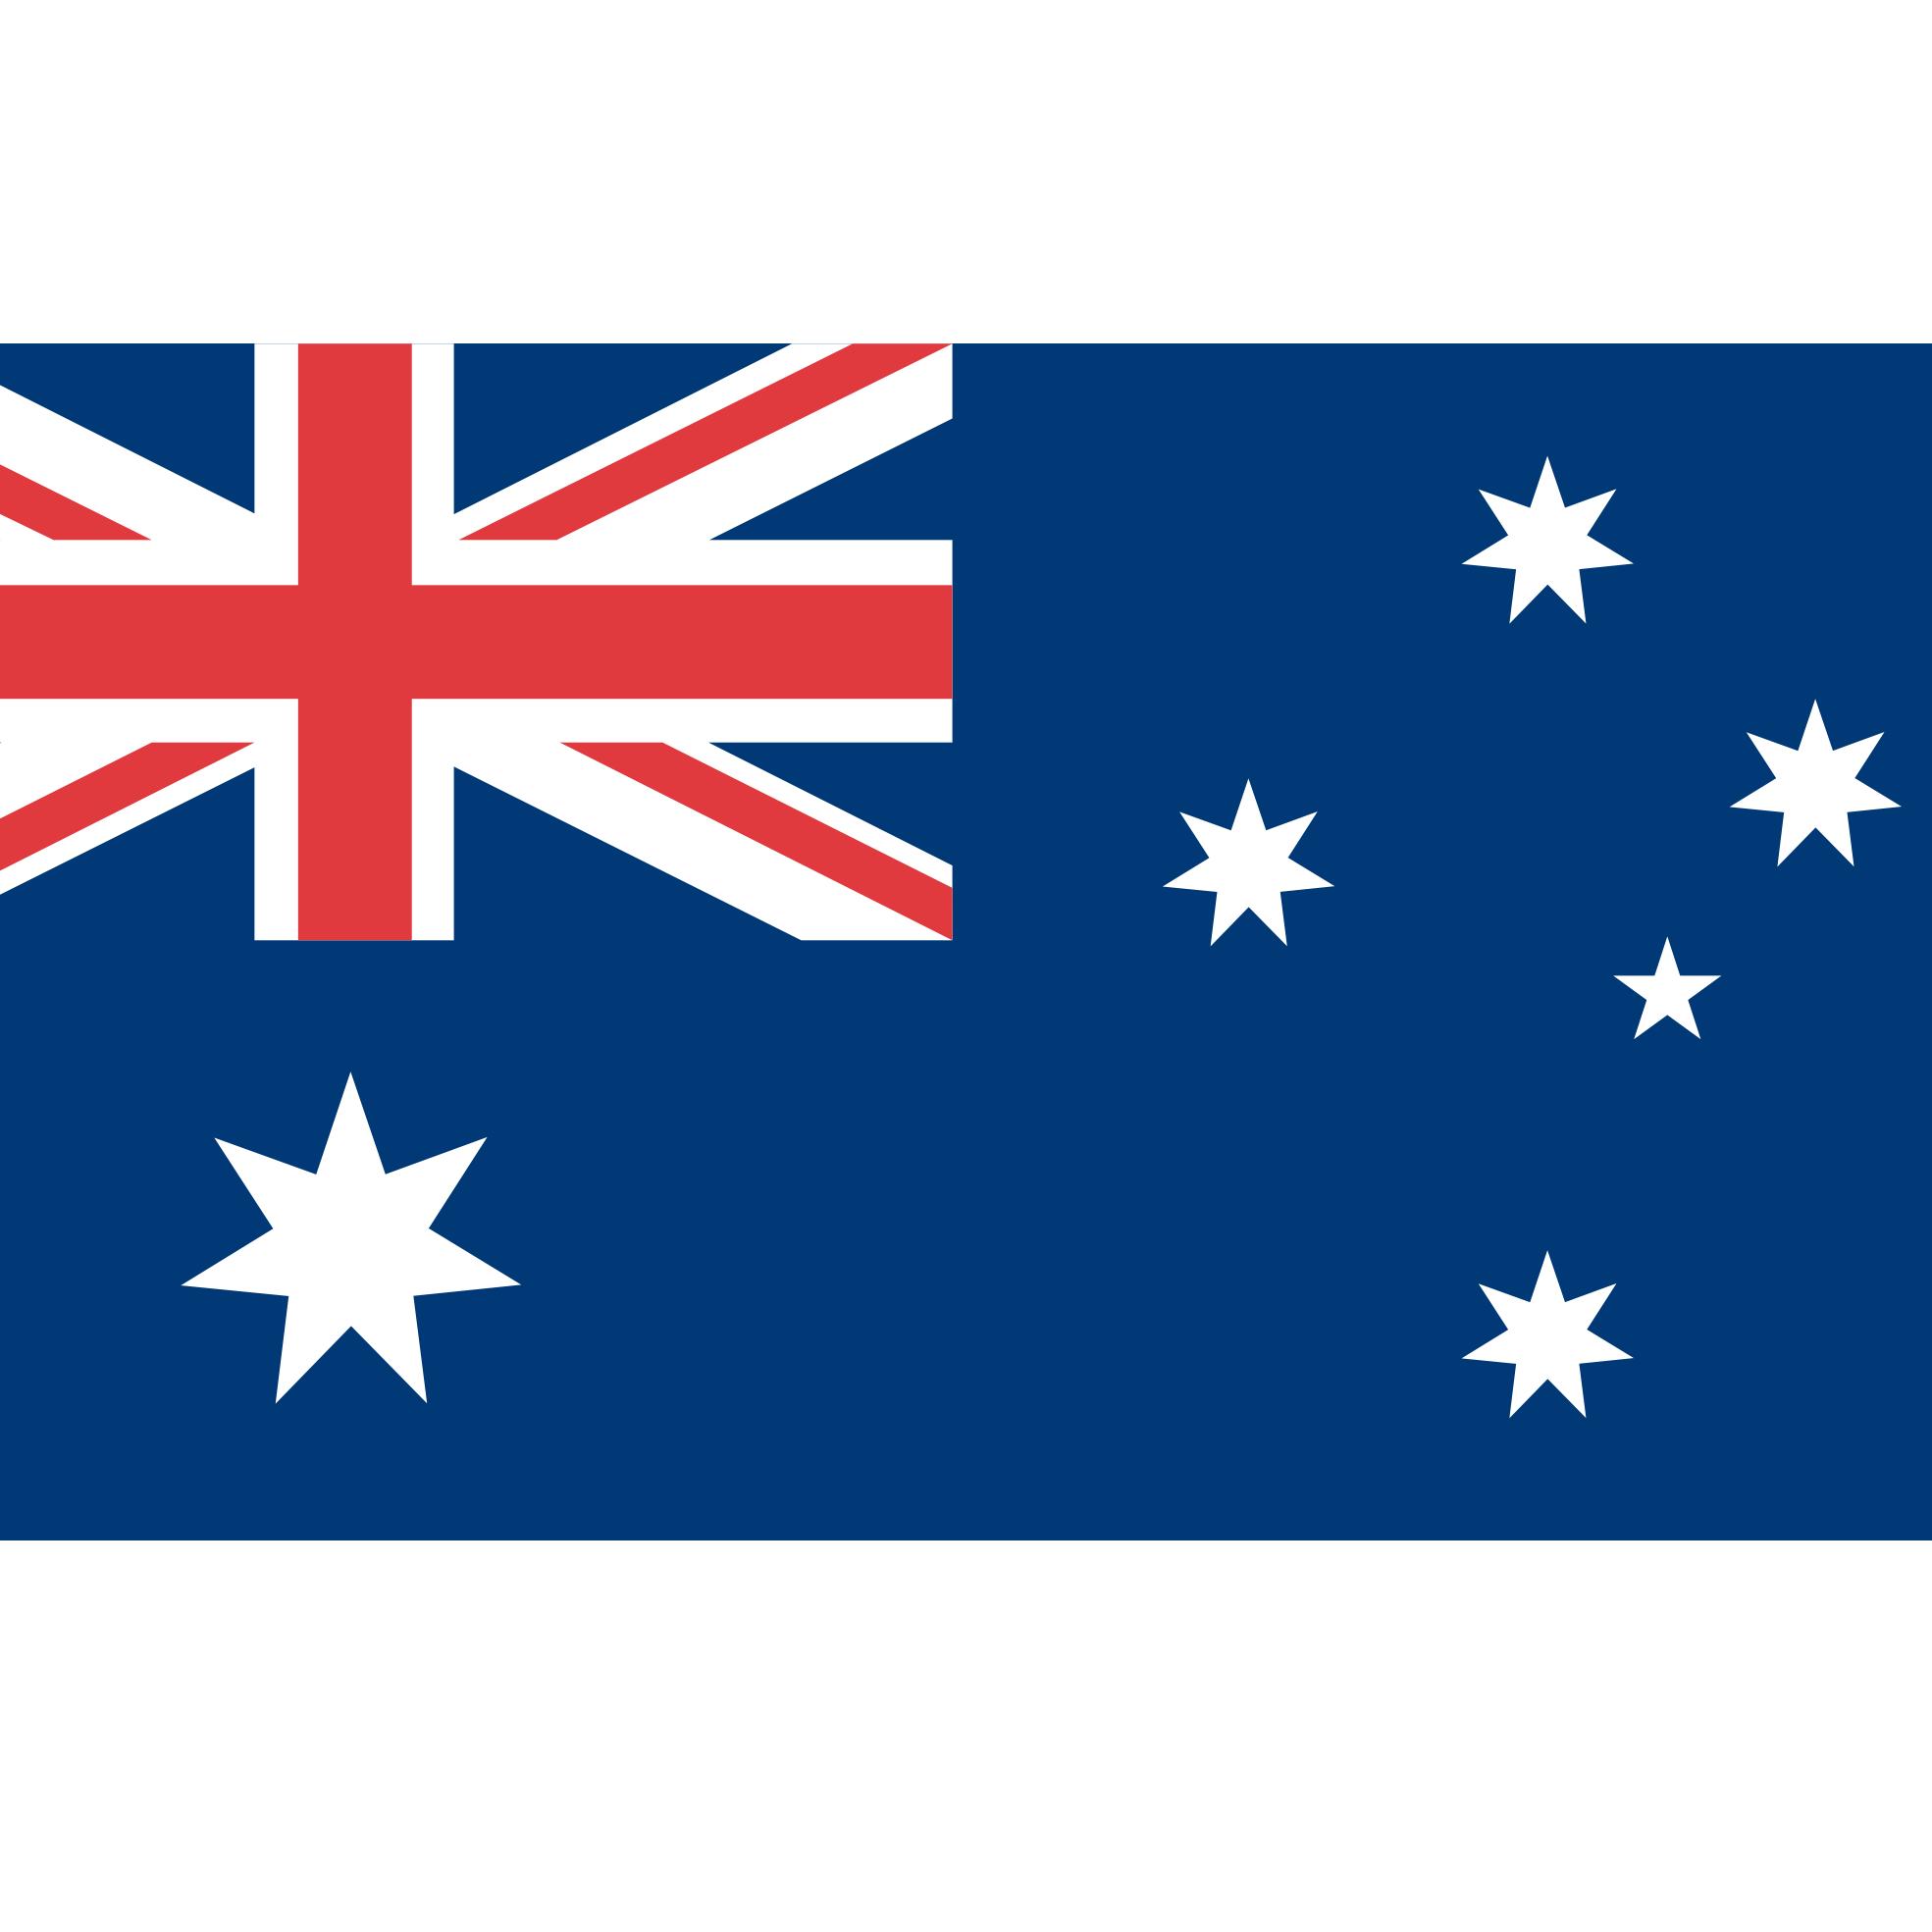 Australia flag transparent clipart png download Free Australia Transparent, Download Free Clip Art, Free Clip Art on ... png download